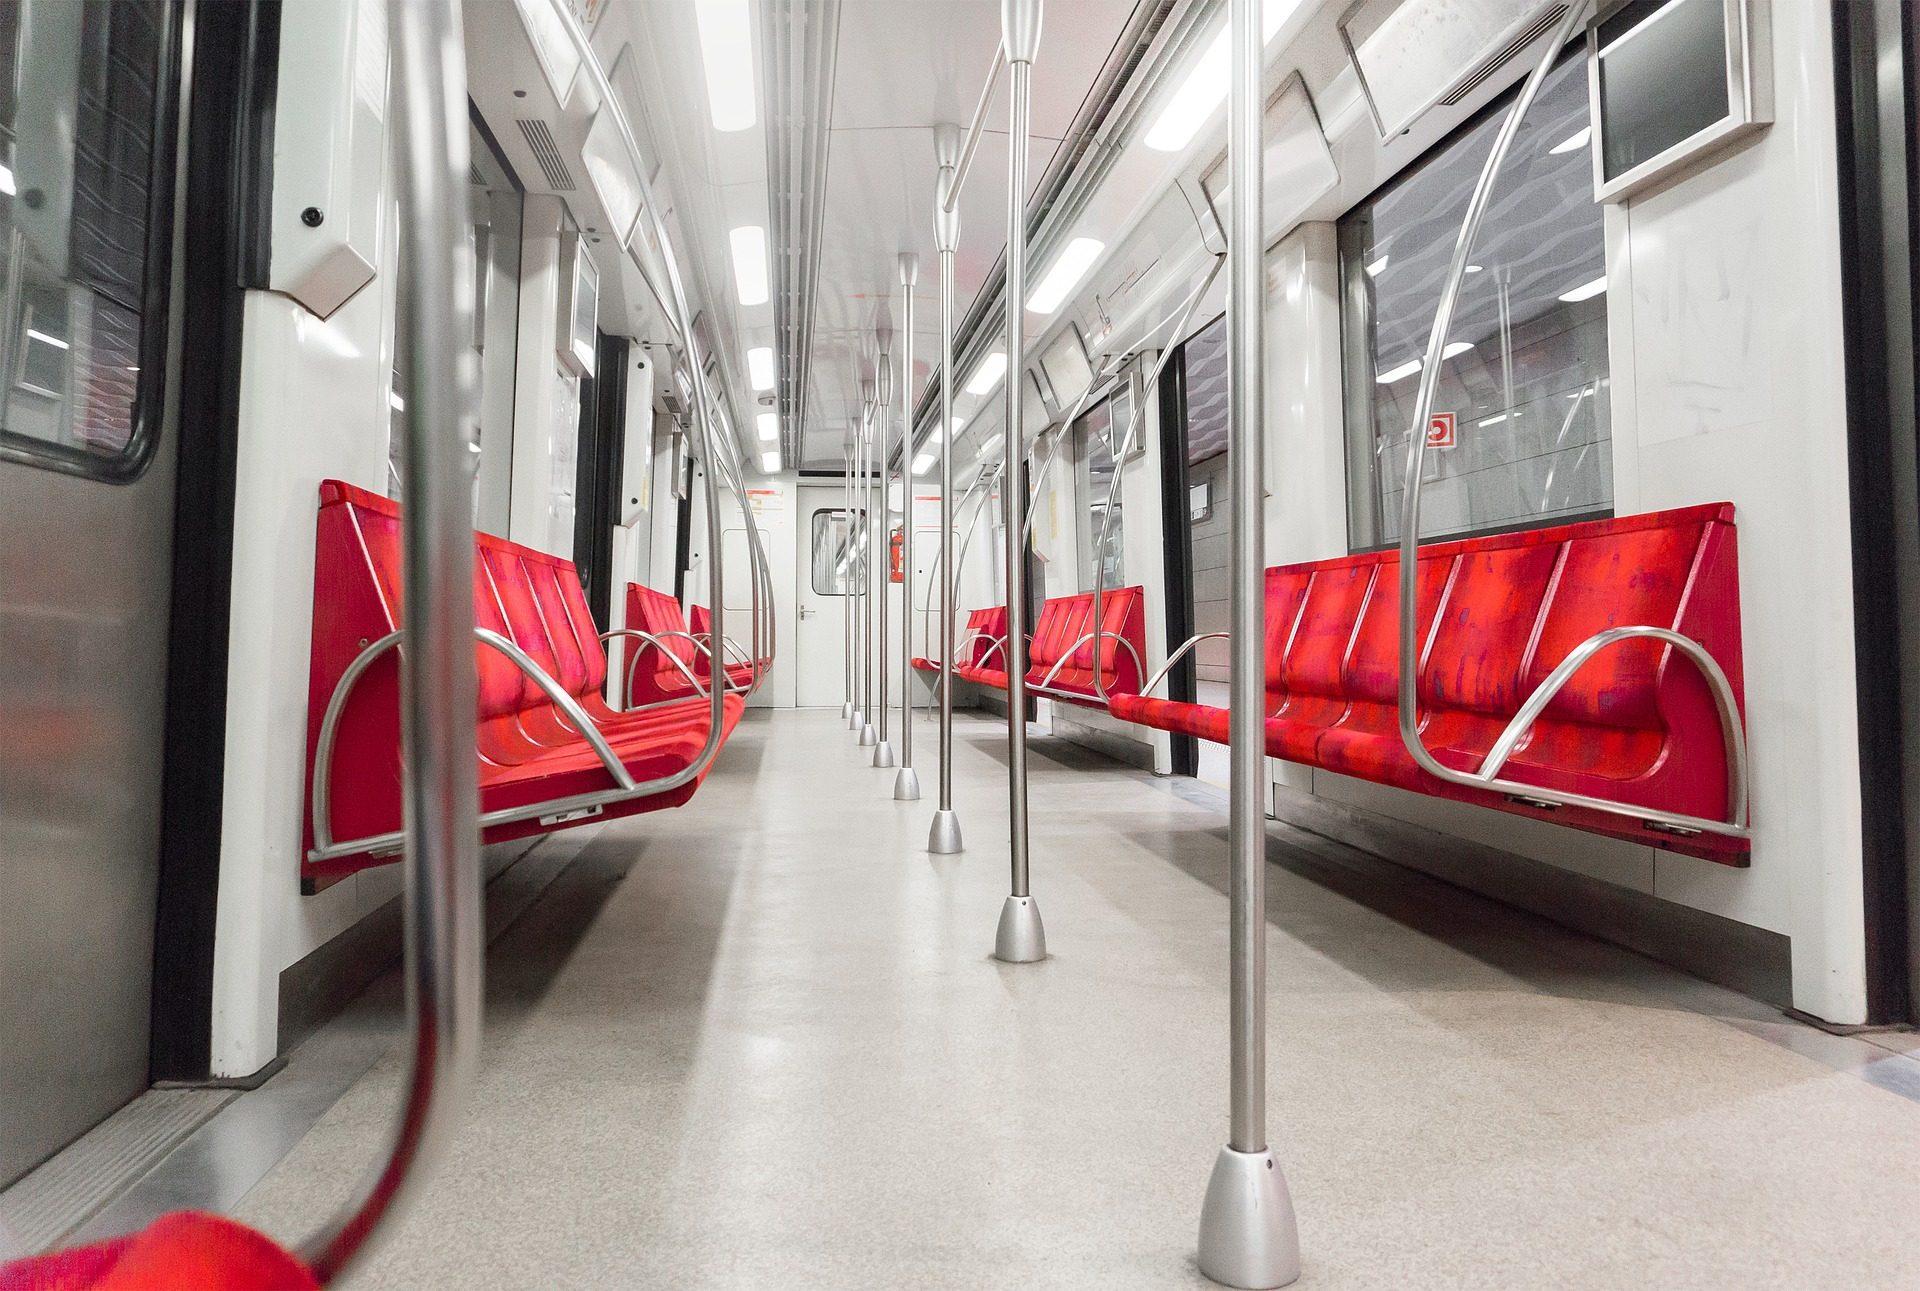 मेट्रो, ट्राम, वैगन, सीटें, धातु, Soledad - HD वॉलपेपर - प्रोफेसर-falken.com